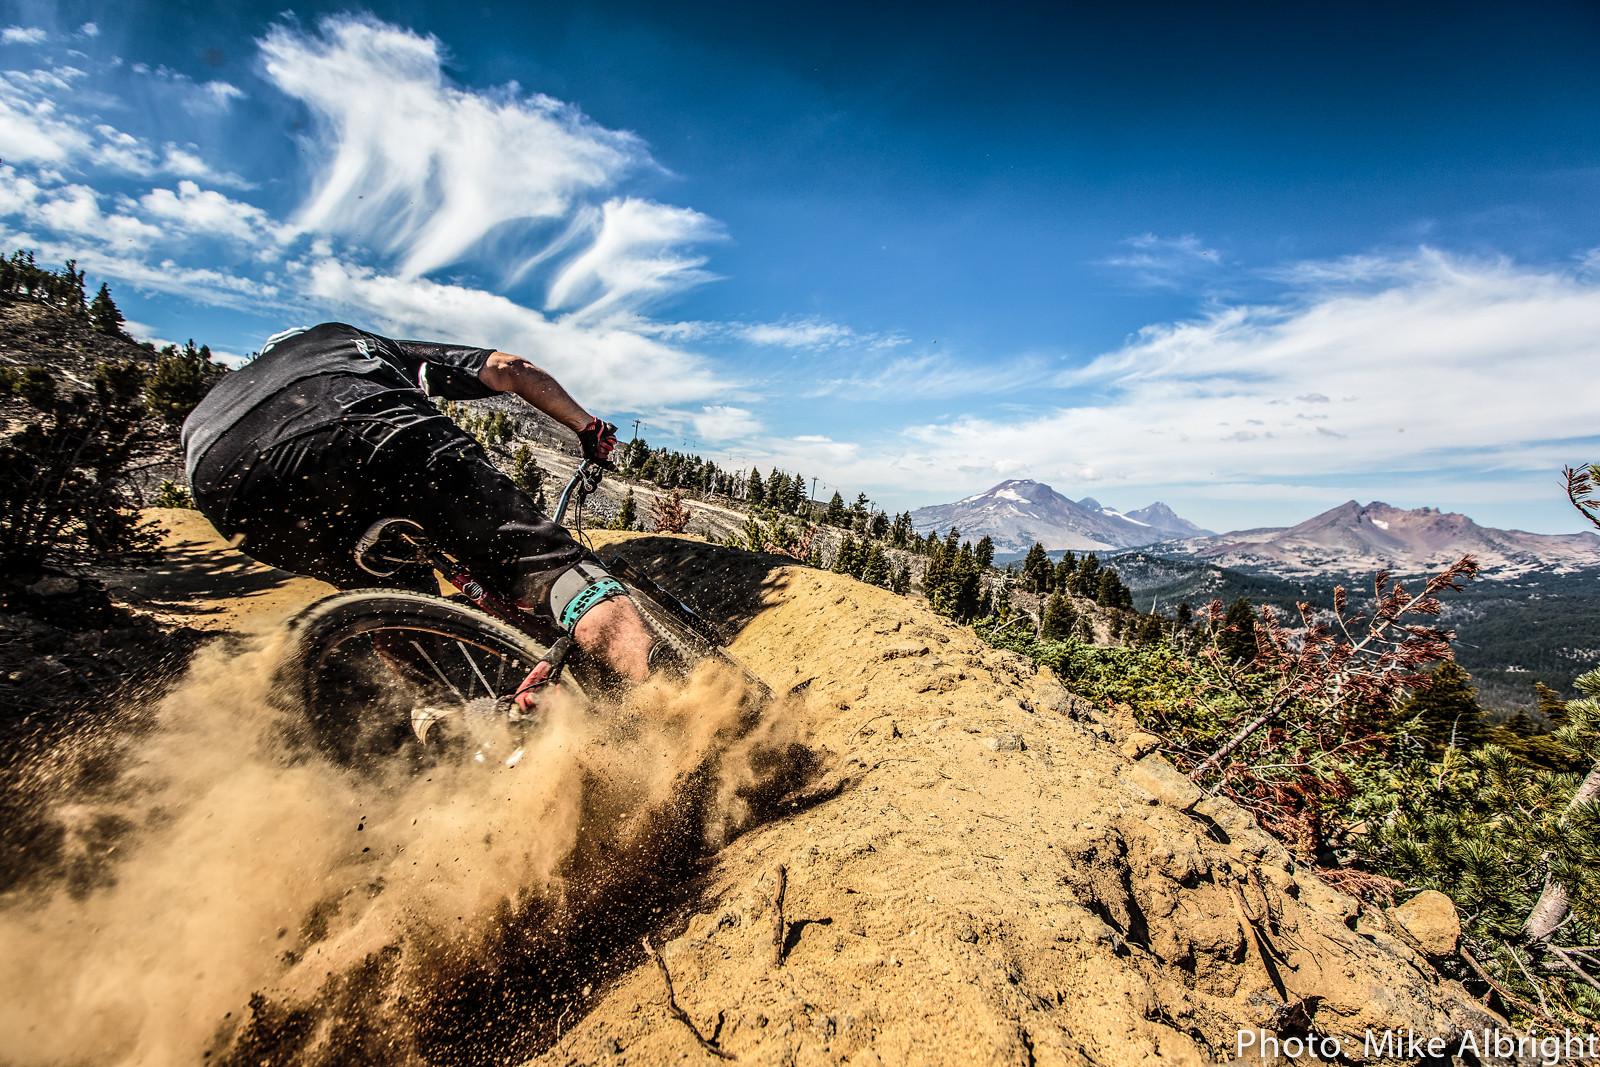 Rob Dunnet helps break in Mt. Bachelor. - bikesales - Mountain Biking Pictures - Vital MTB